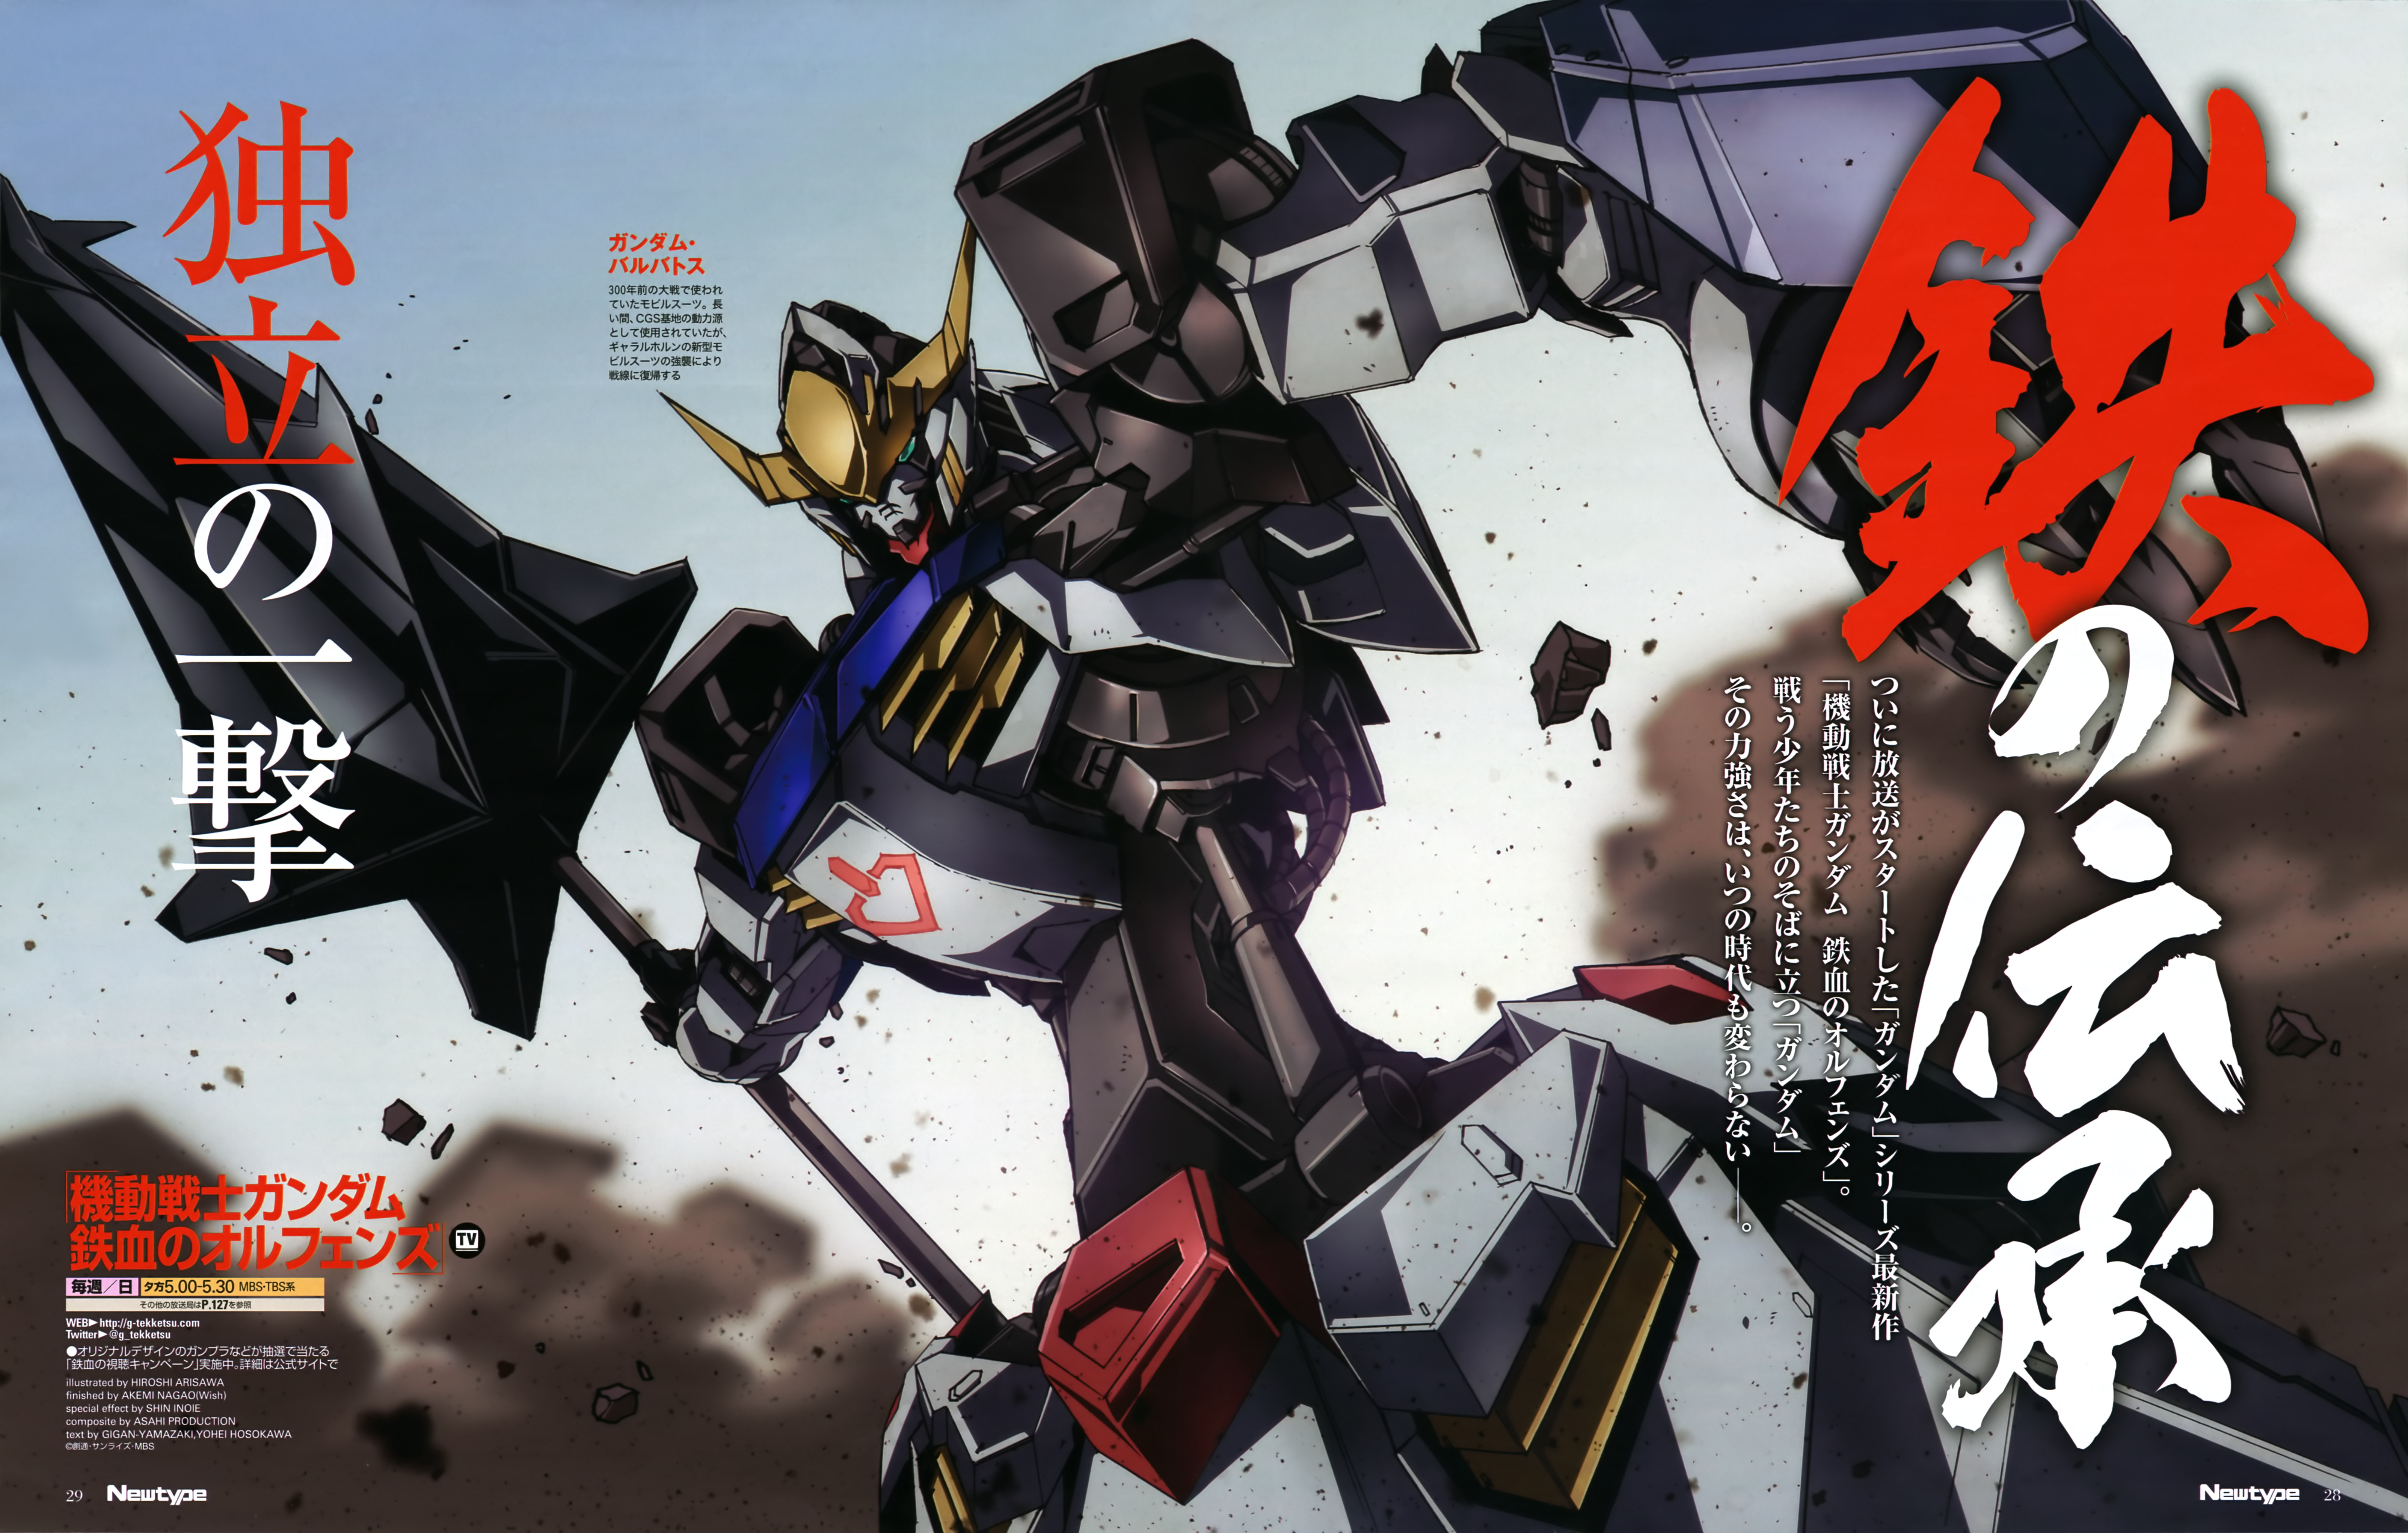 Gundam Iron Blooded Orphans Wallpaper By Corphish2 On Deviantart